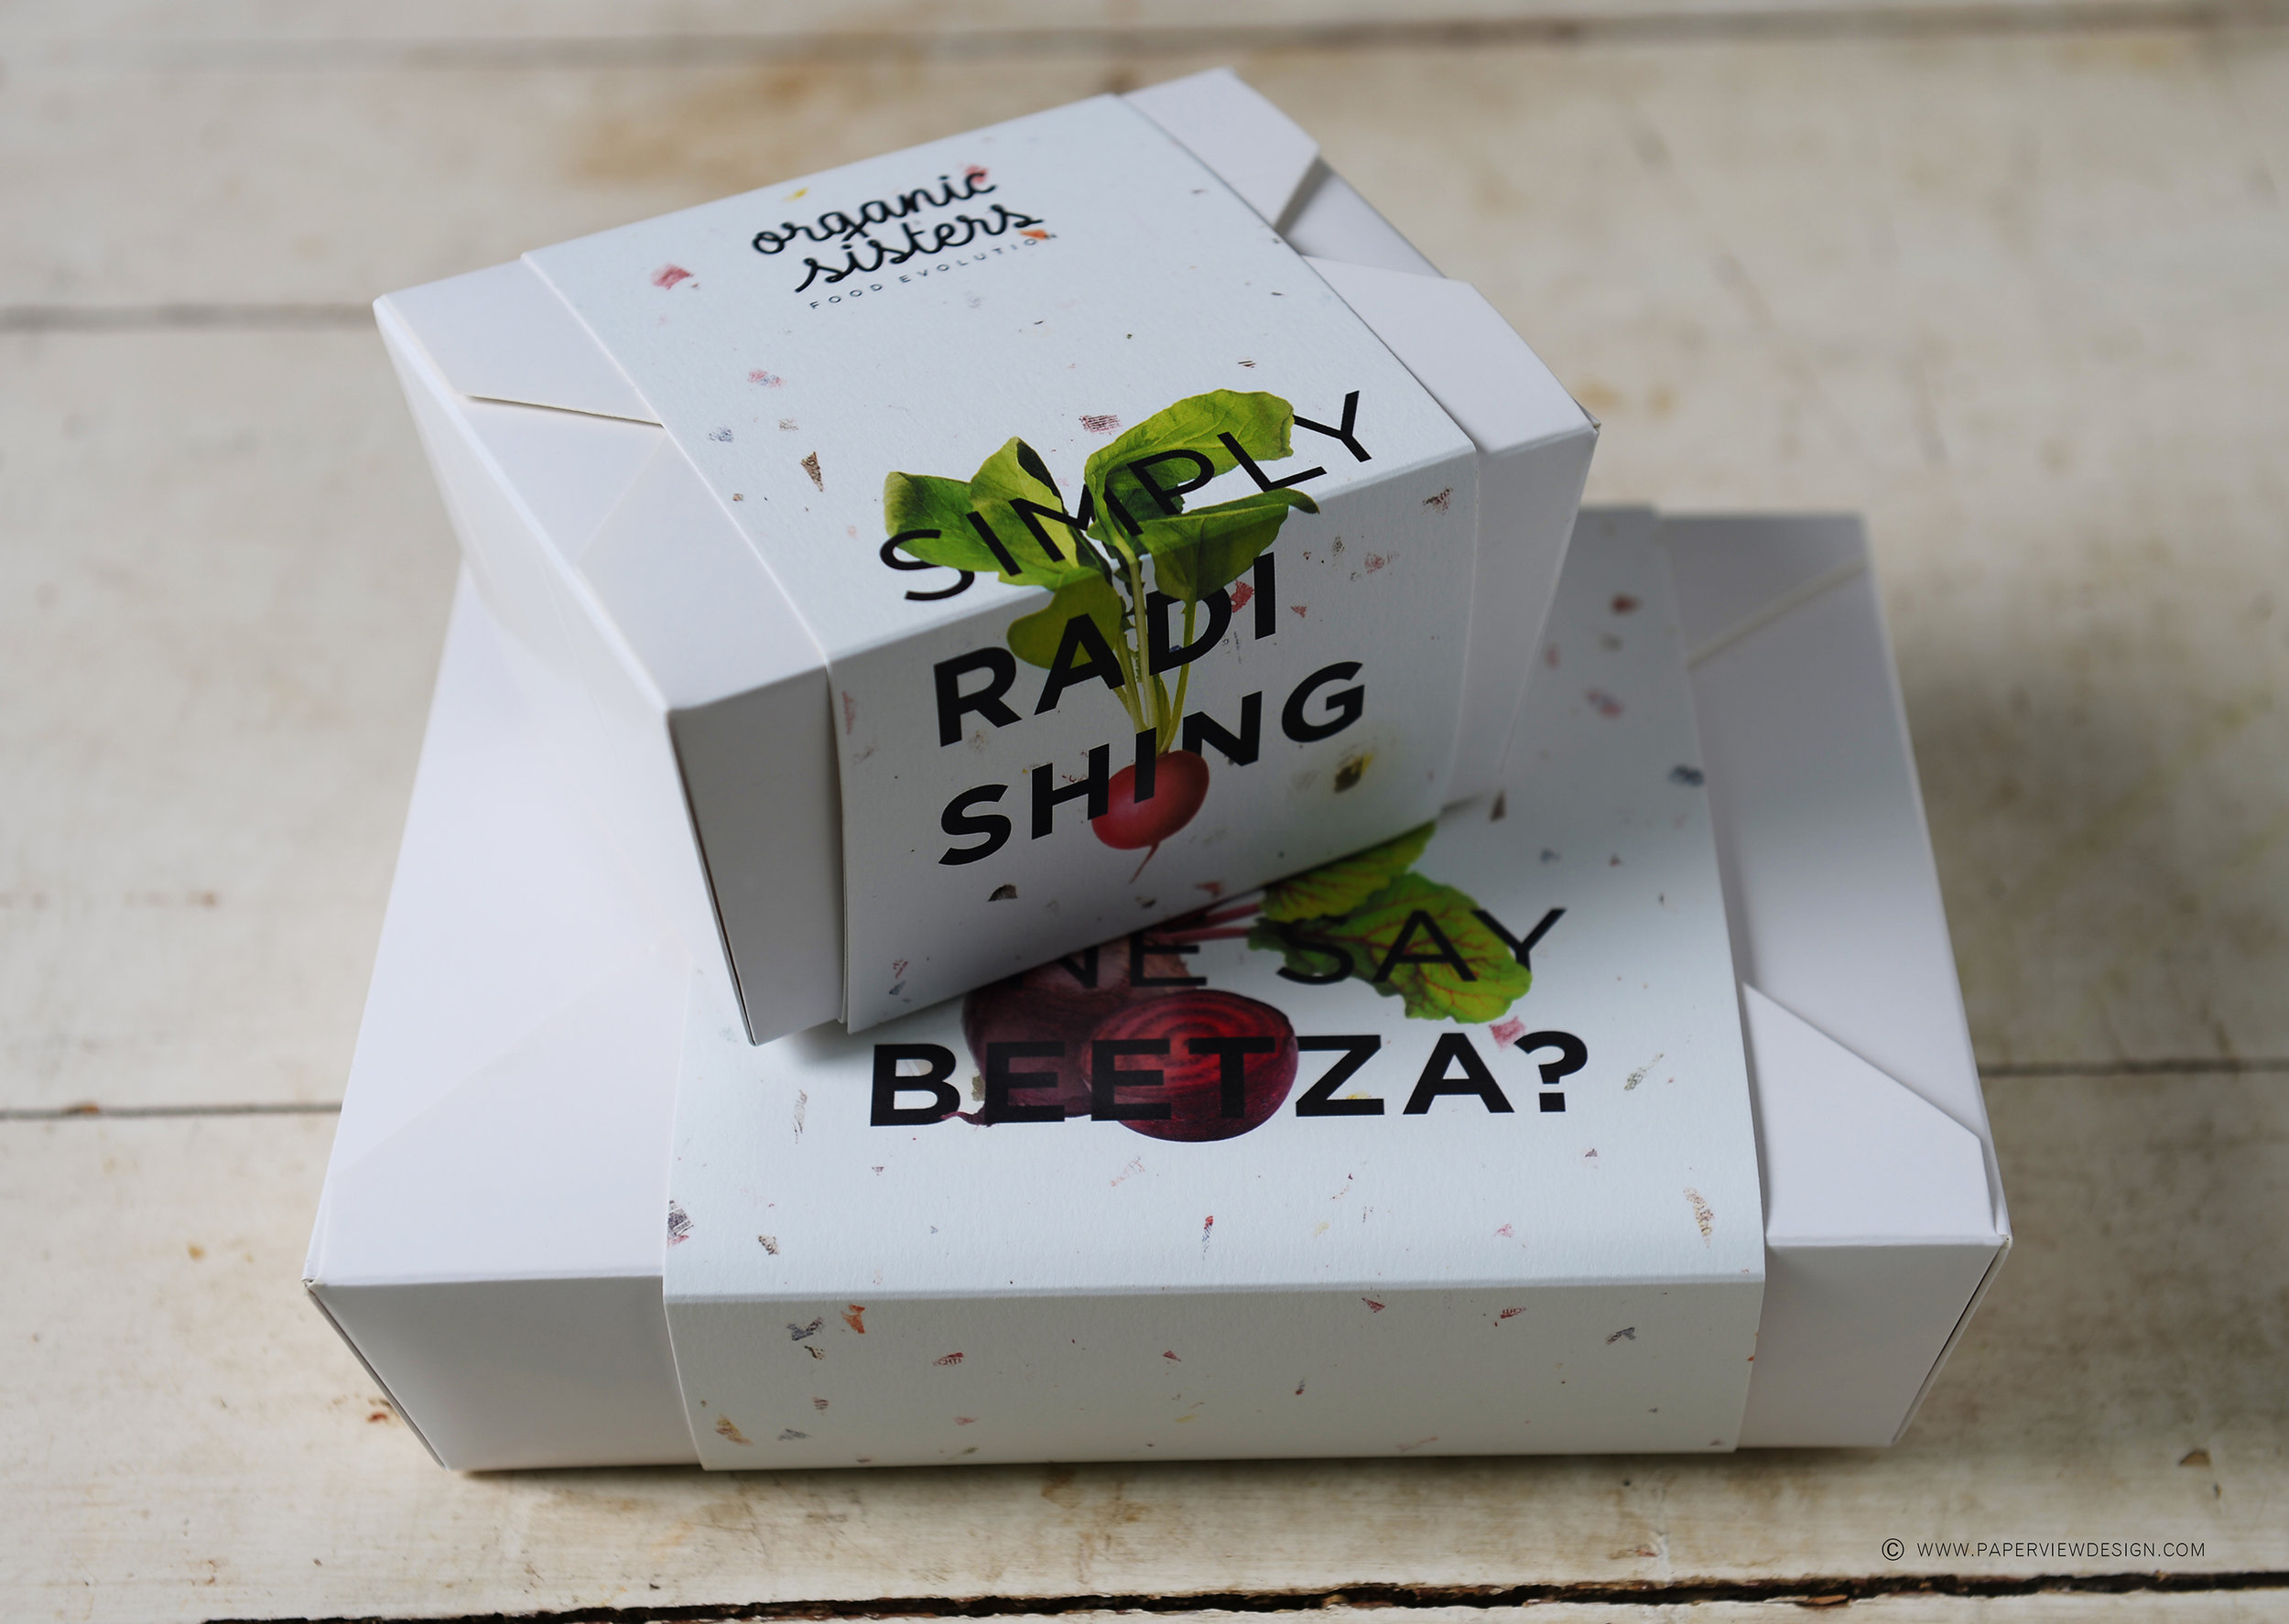 Organic-Sisters-Pizza-Radishing-Boxes.jpg